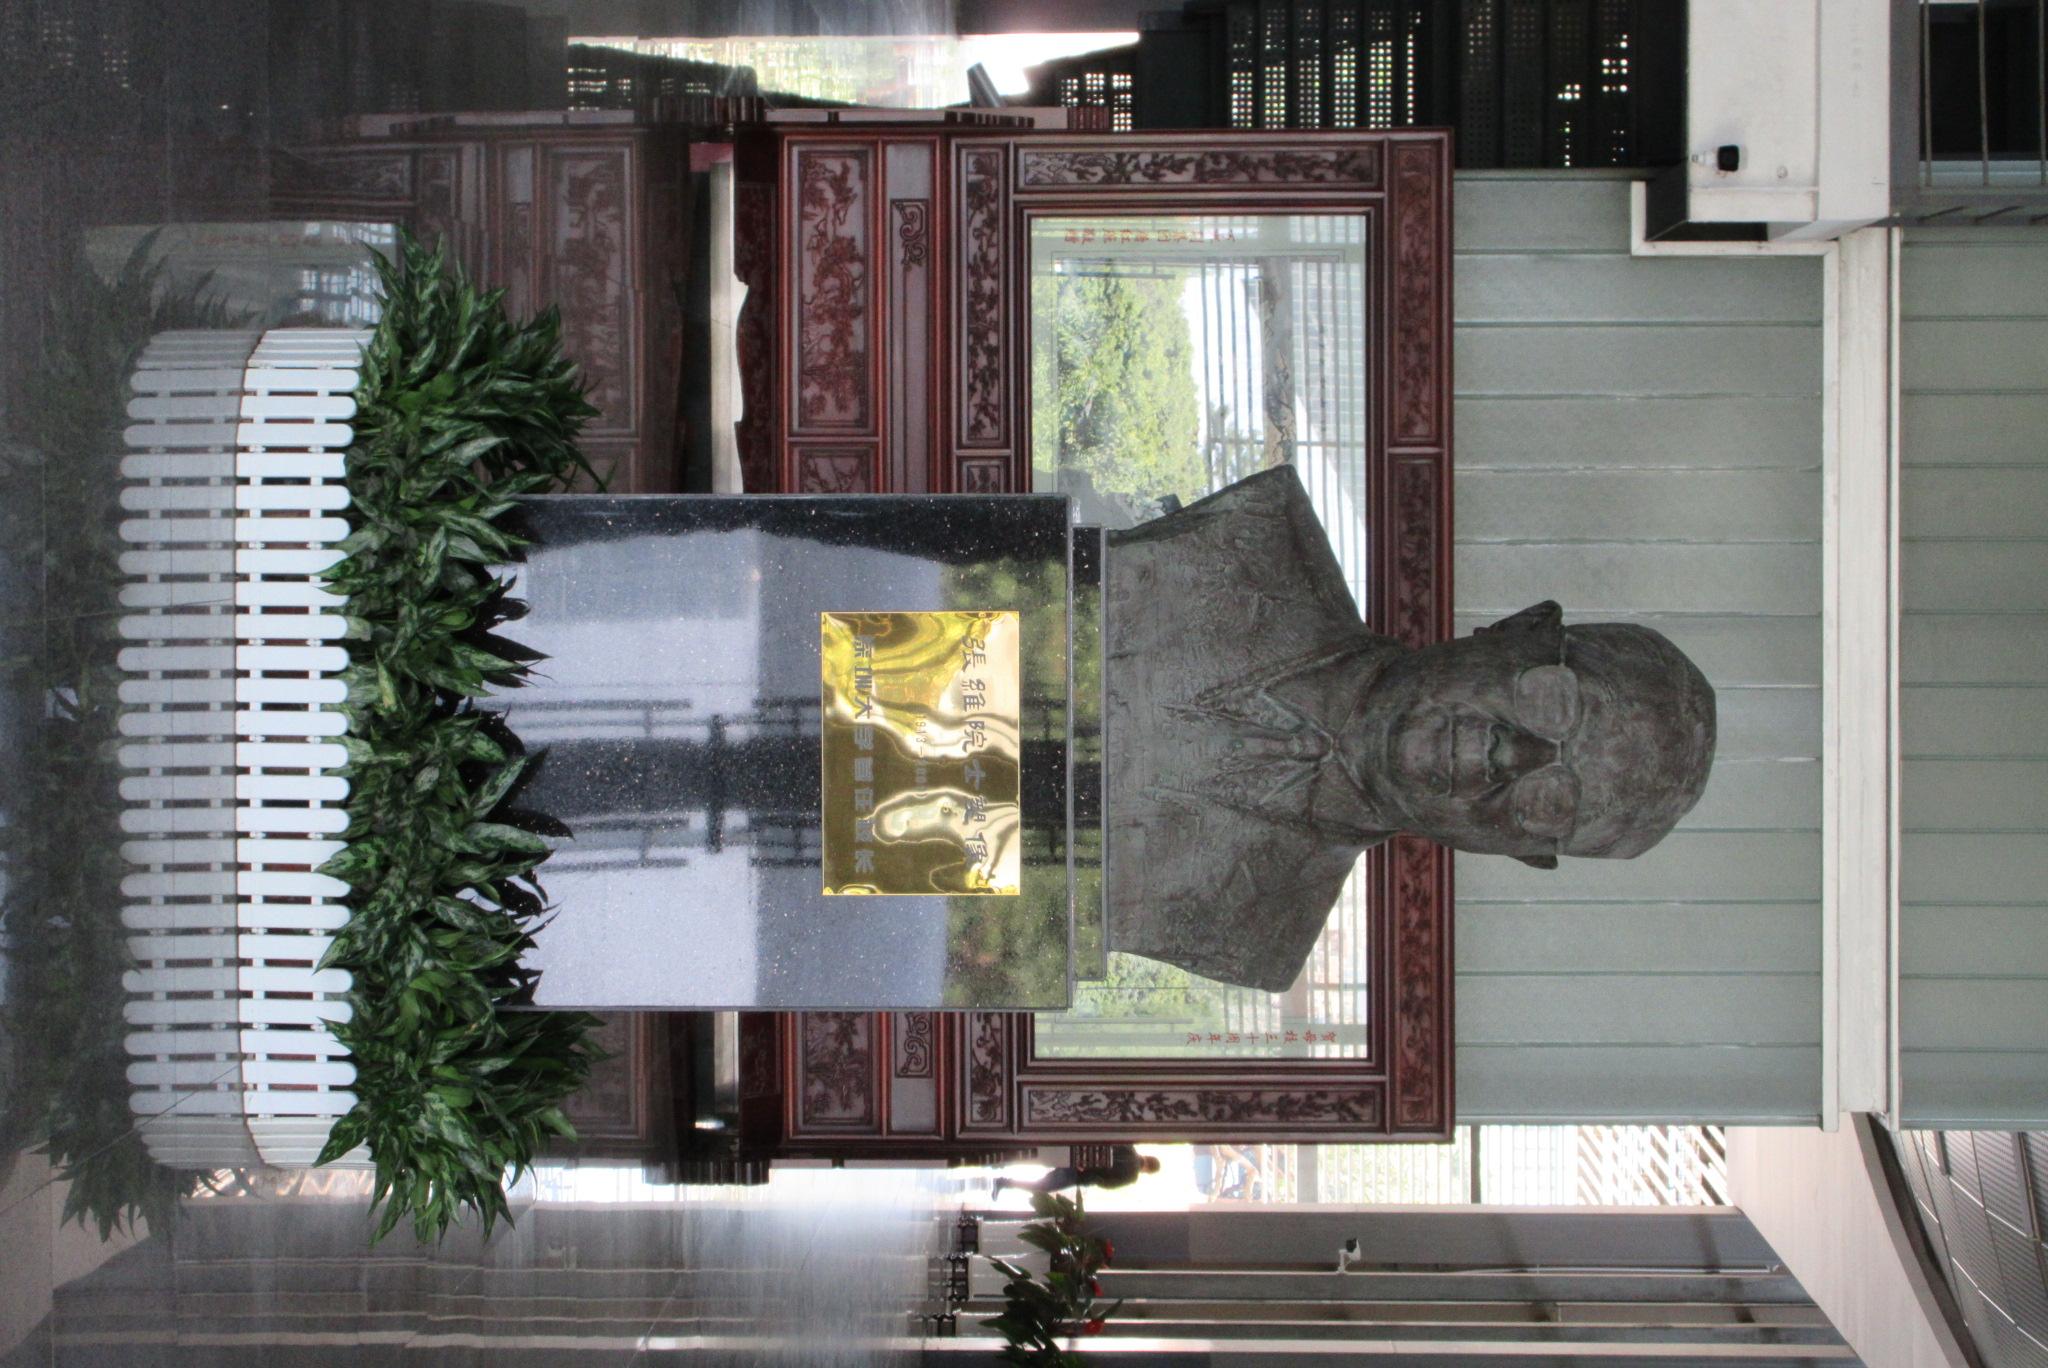 image of Zhang Wei